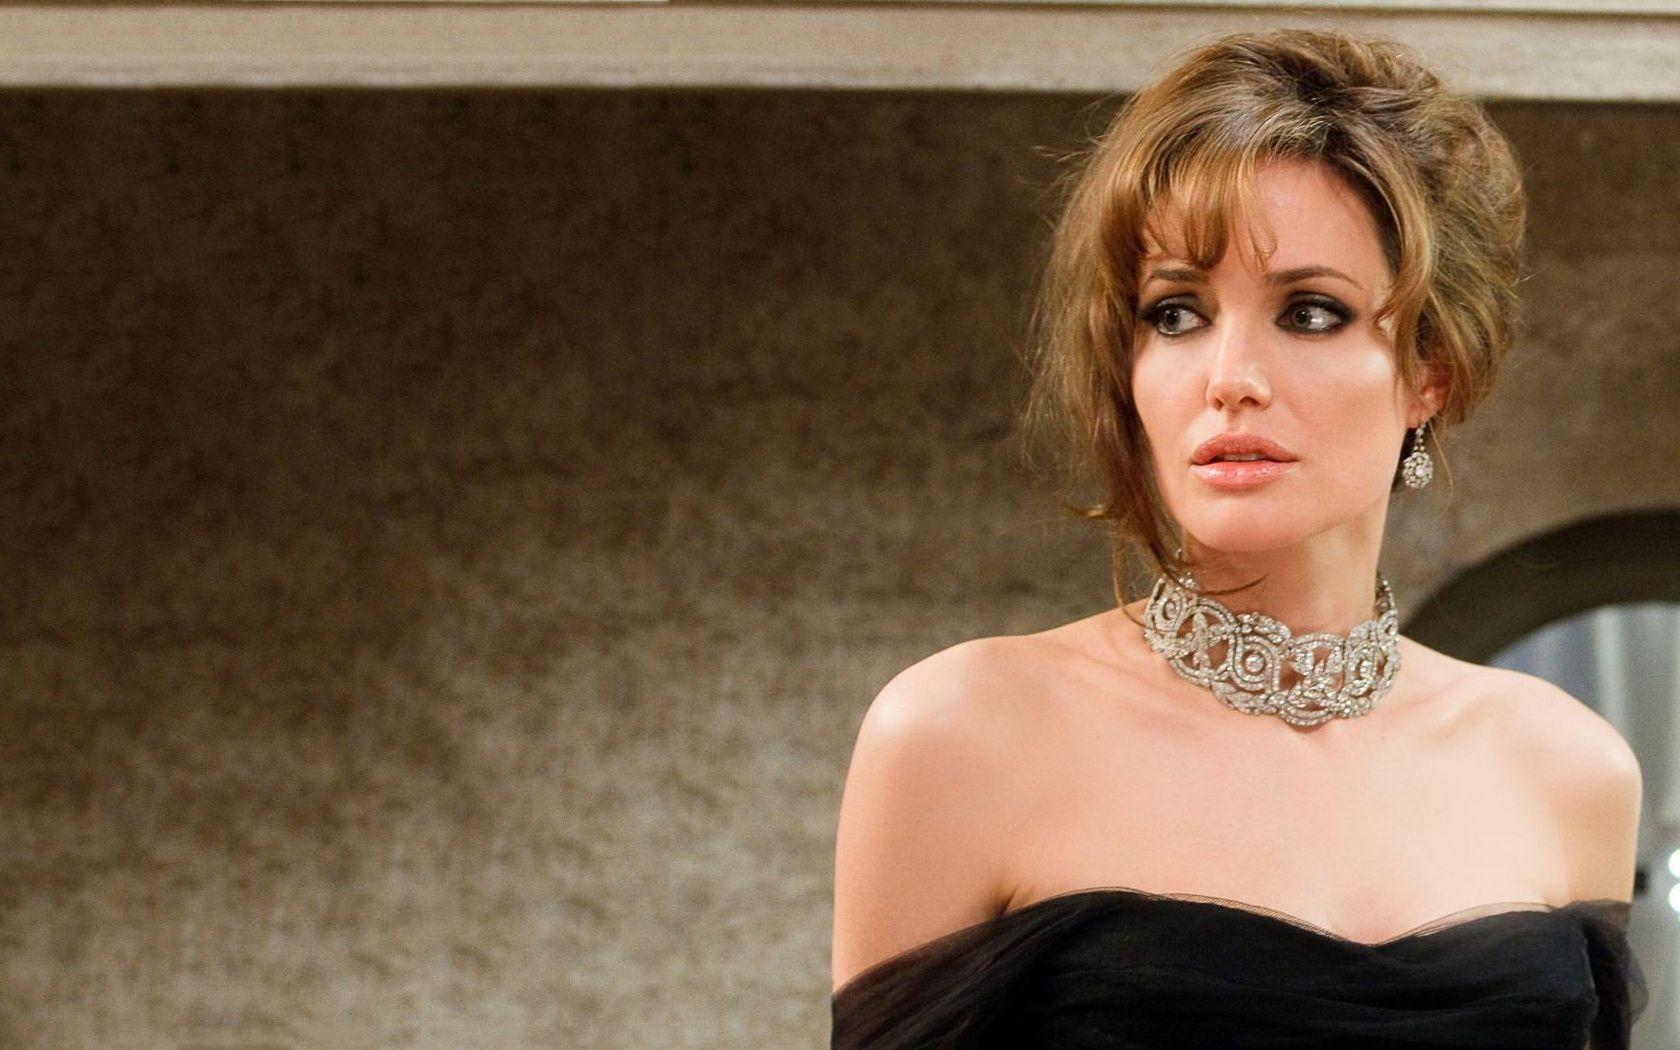 Angelina Jolie Jeweled Collar With Images Angelina Jolie